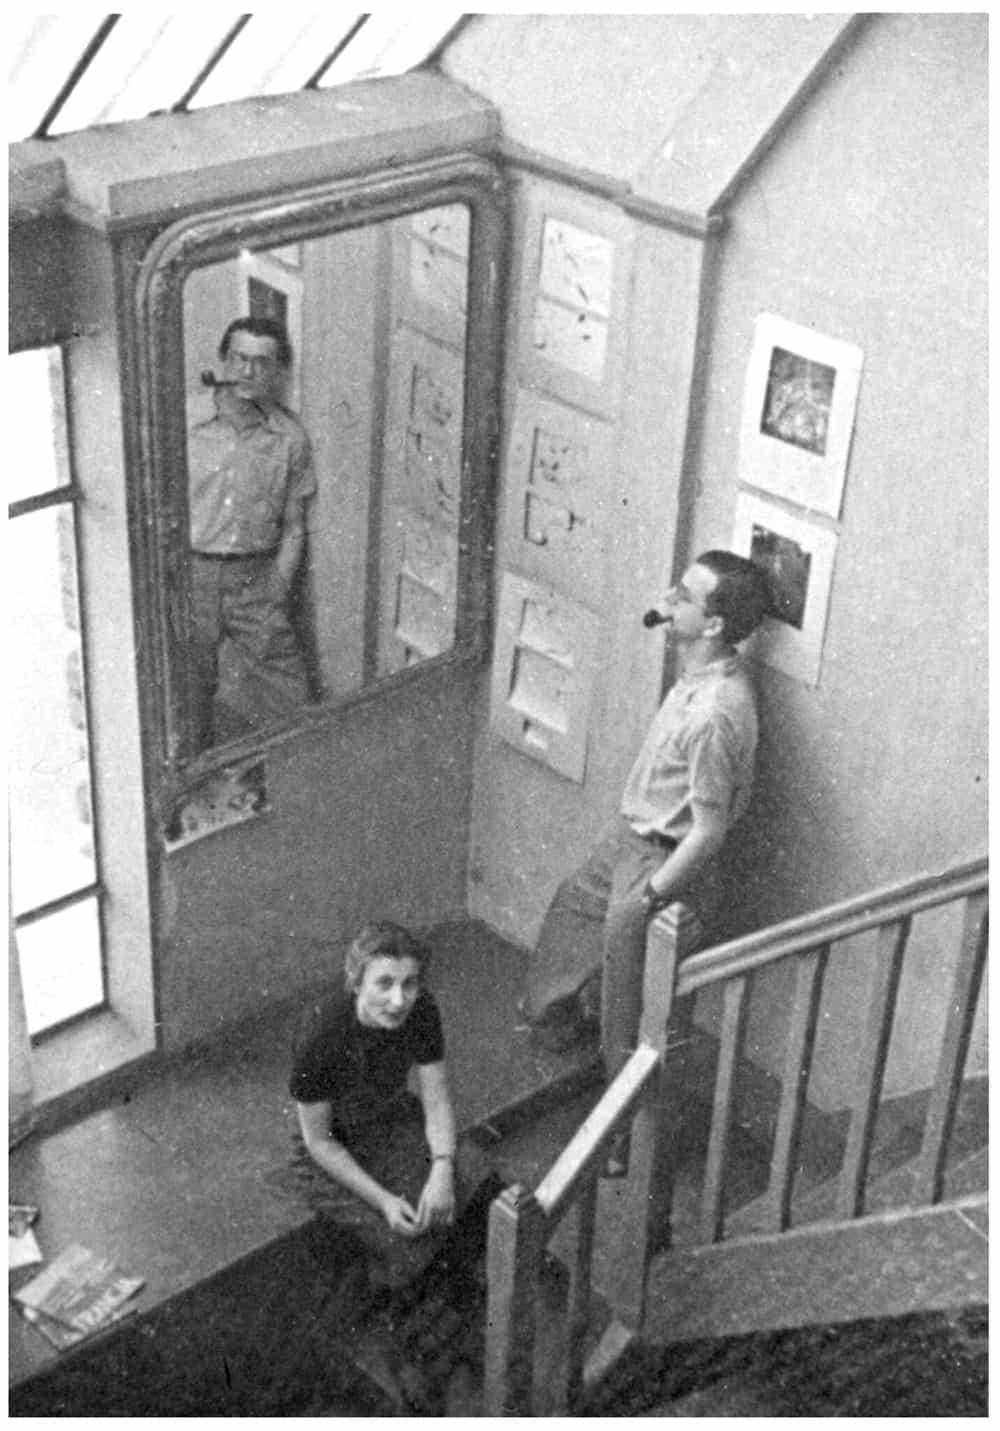 Franciszka and Stefan Themerson in their studio, Paris, 1938